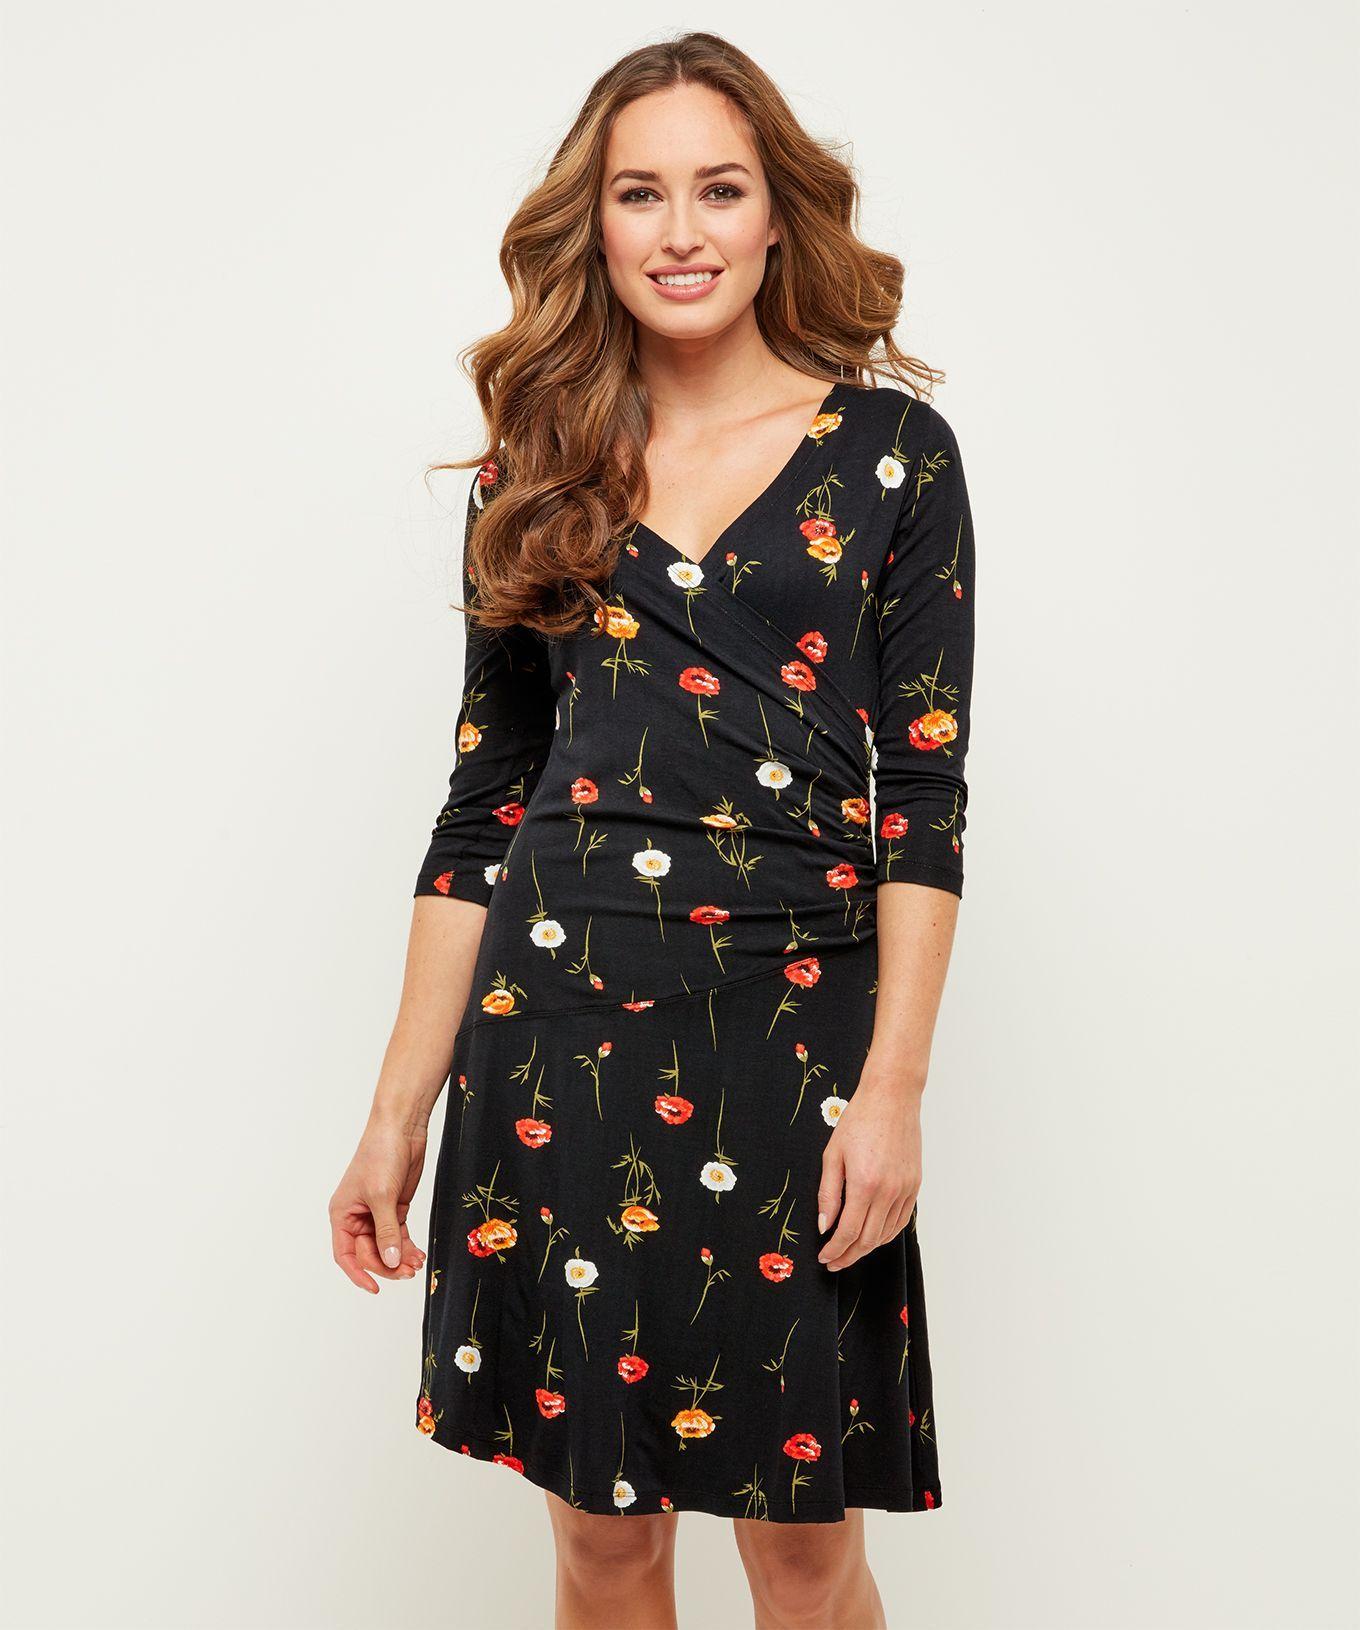 fbea8913aa Moonlit Petal Dress Another super flattering dress for the autumn season.  This vivid poppy print